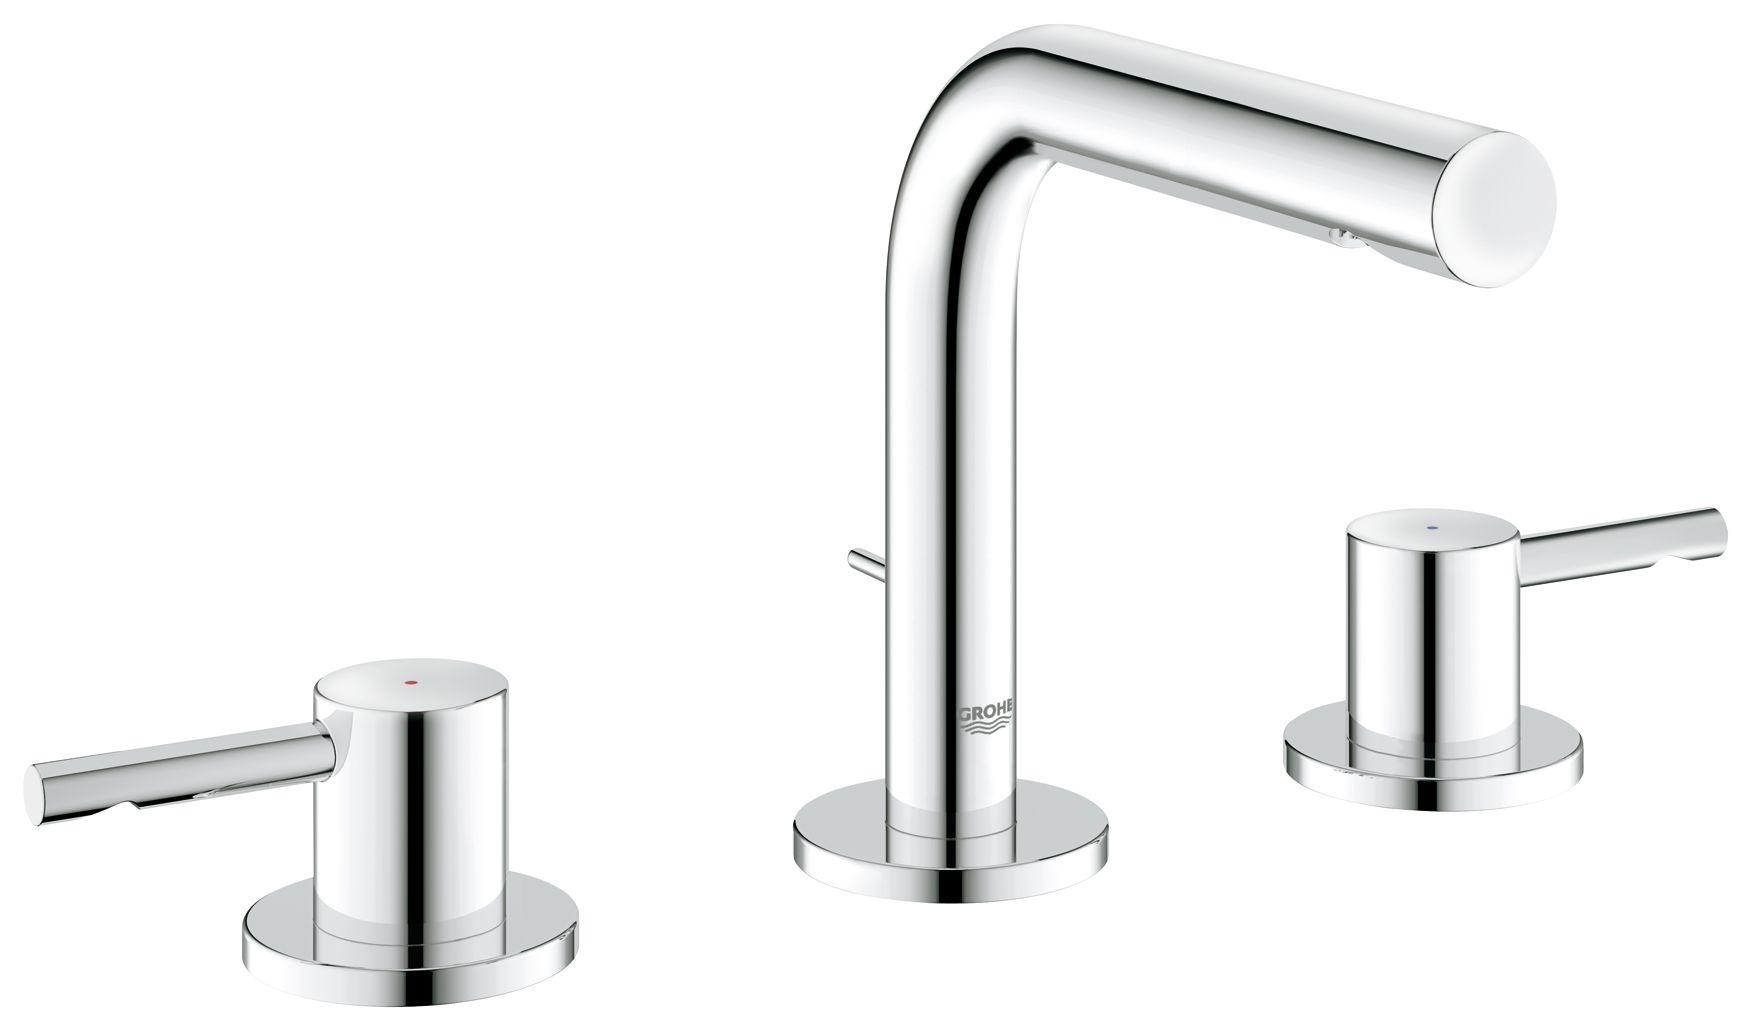 Essence 3-hole basin mixer S-Size